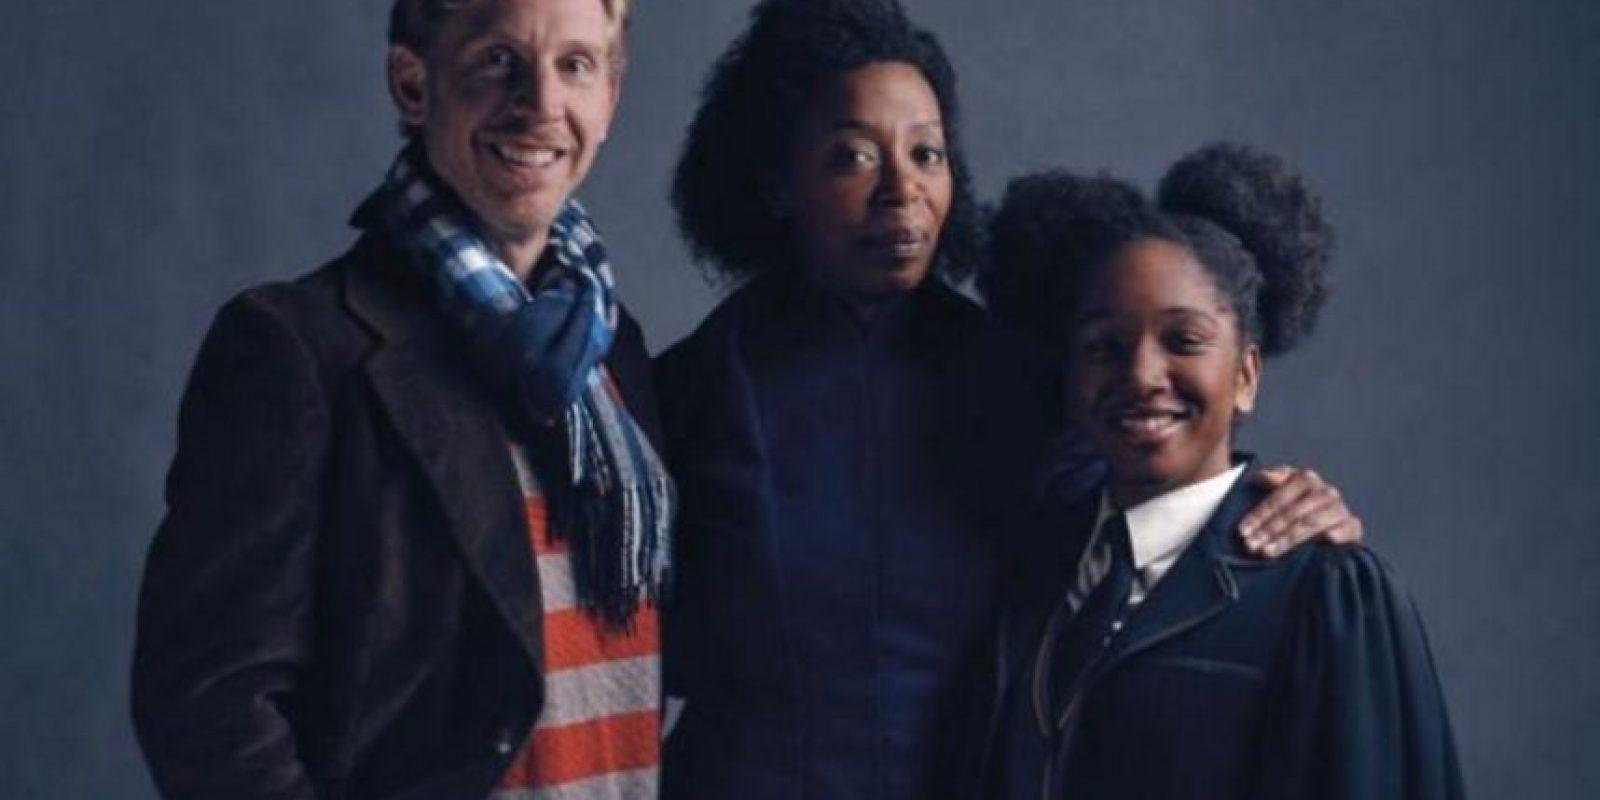 Hermione causó revuelo por ser afroamericana. Foto:London Palace Theatre